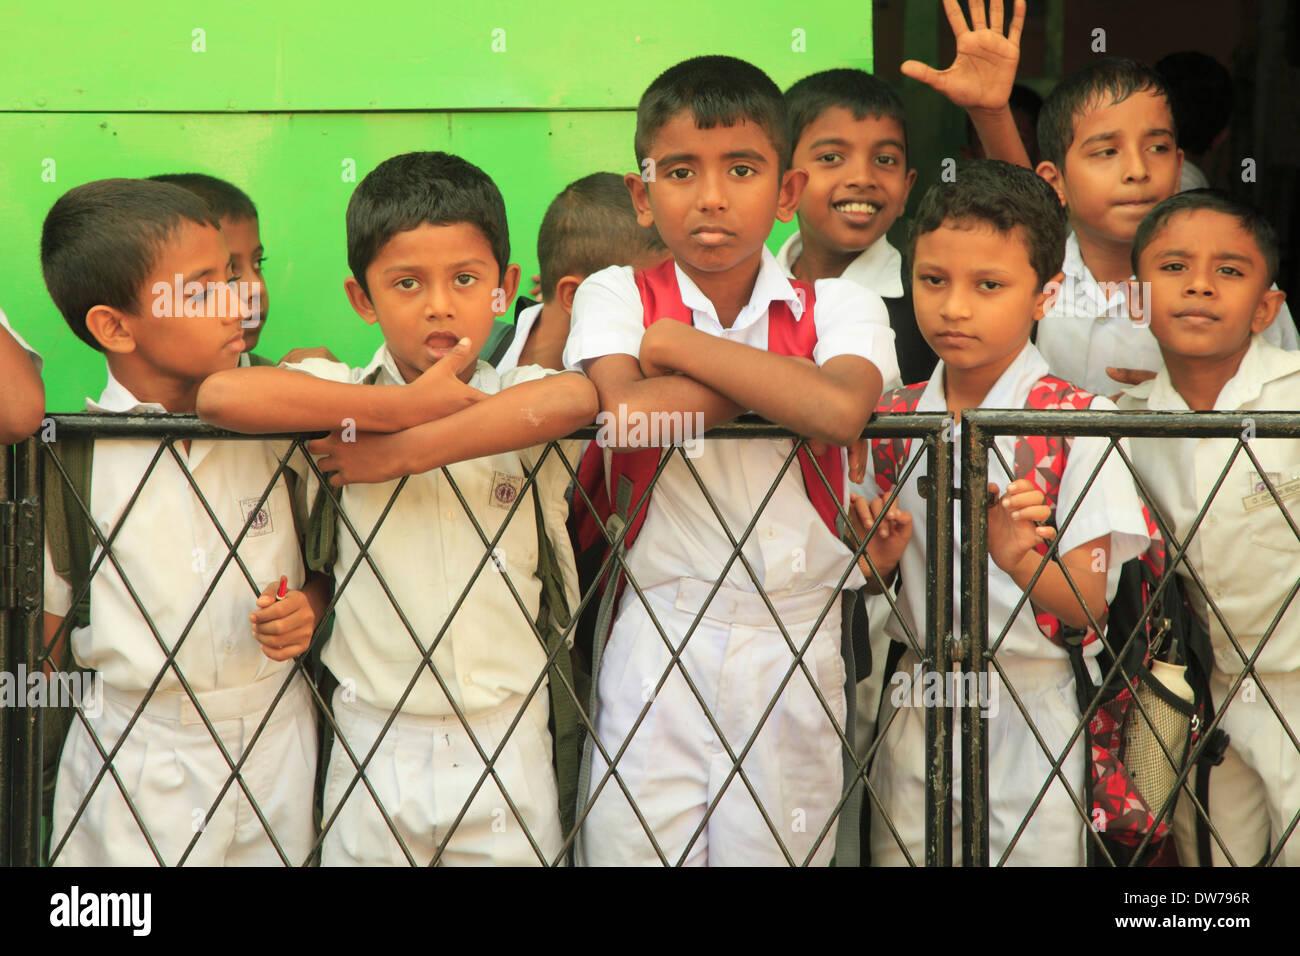 Sri Lanka, Galle, schoolboys, - Stock Image